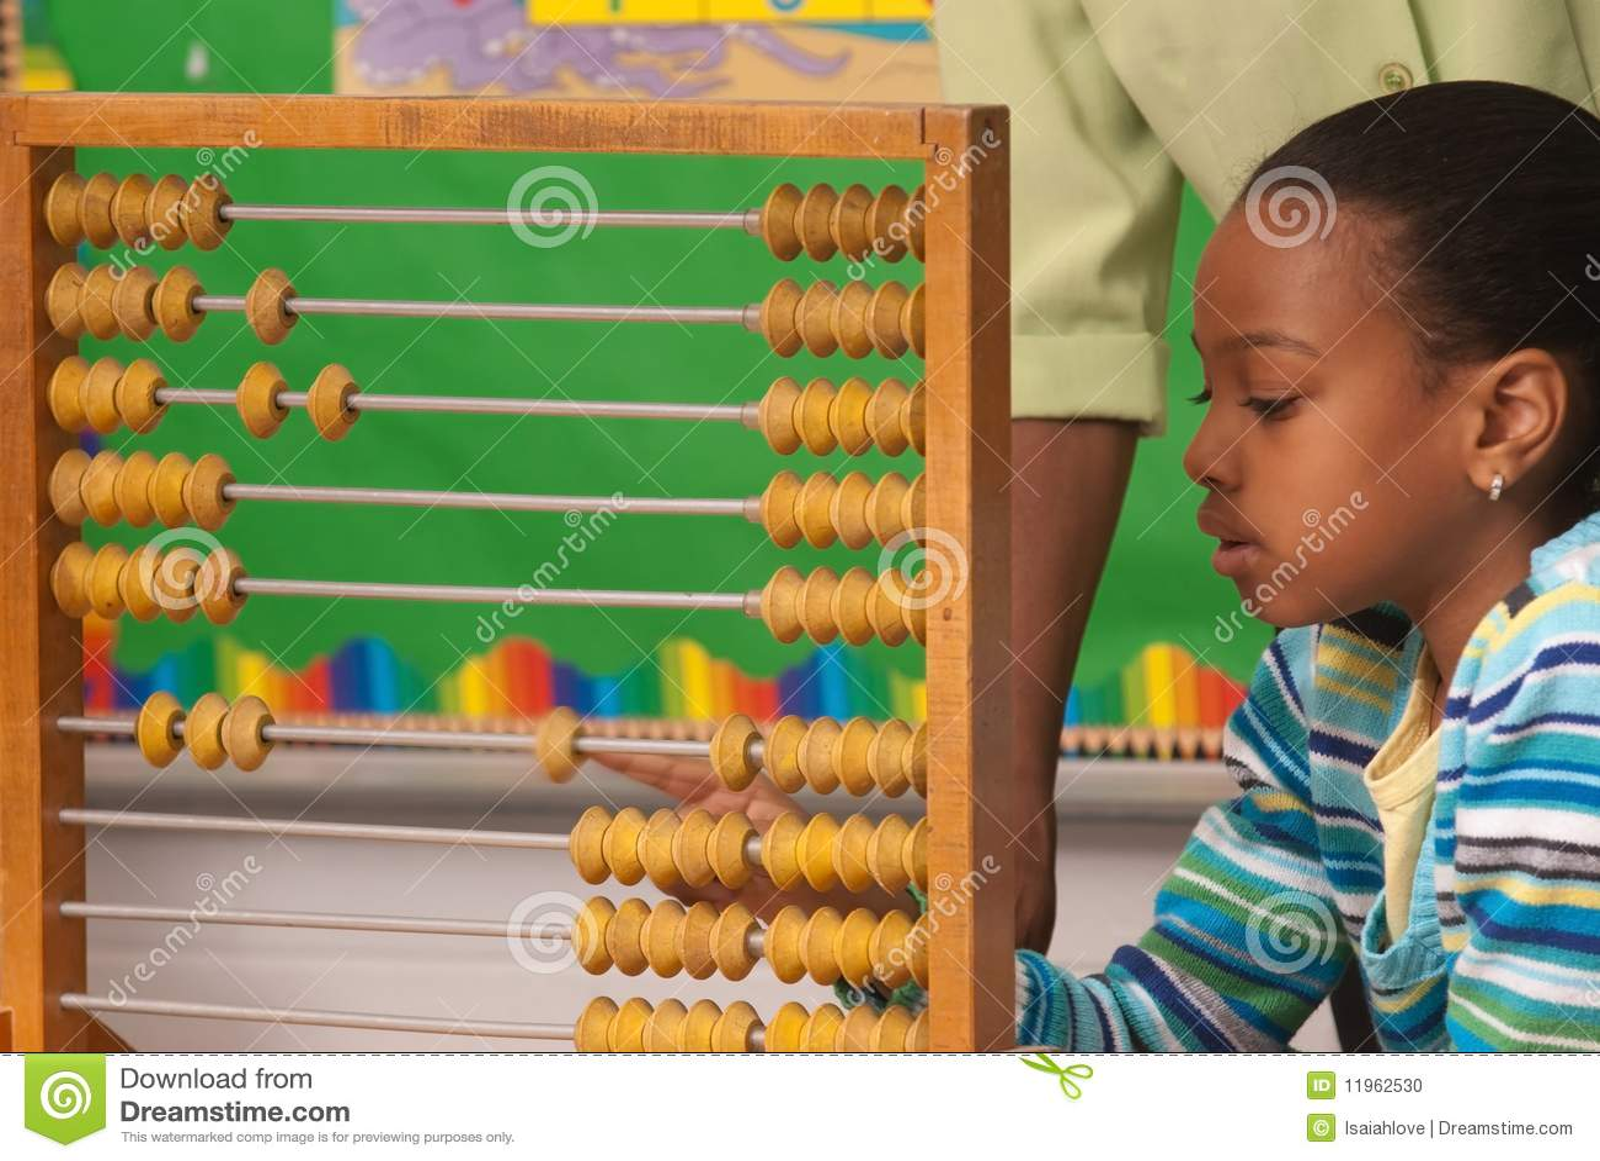 Afrikaans-Amerikaans kind dat een telraam met behulp van